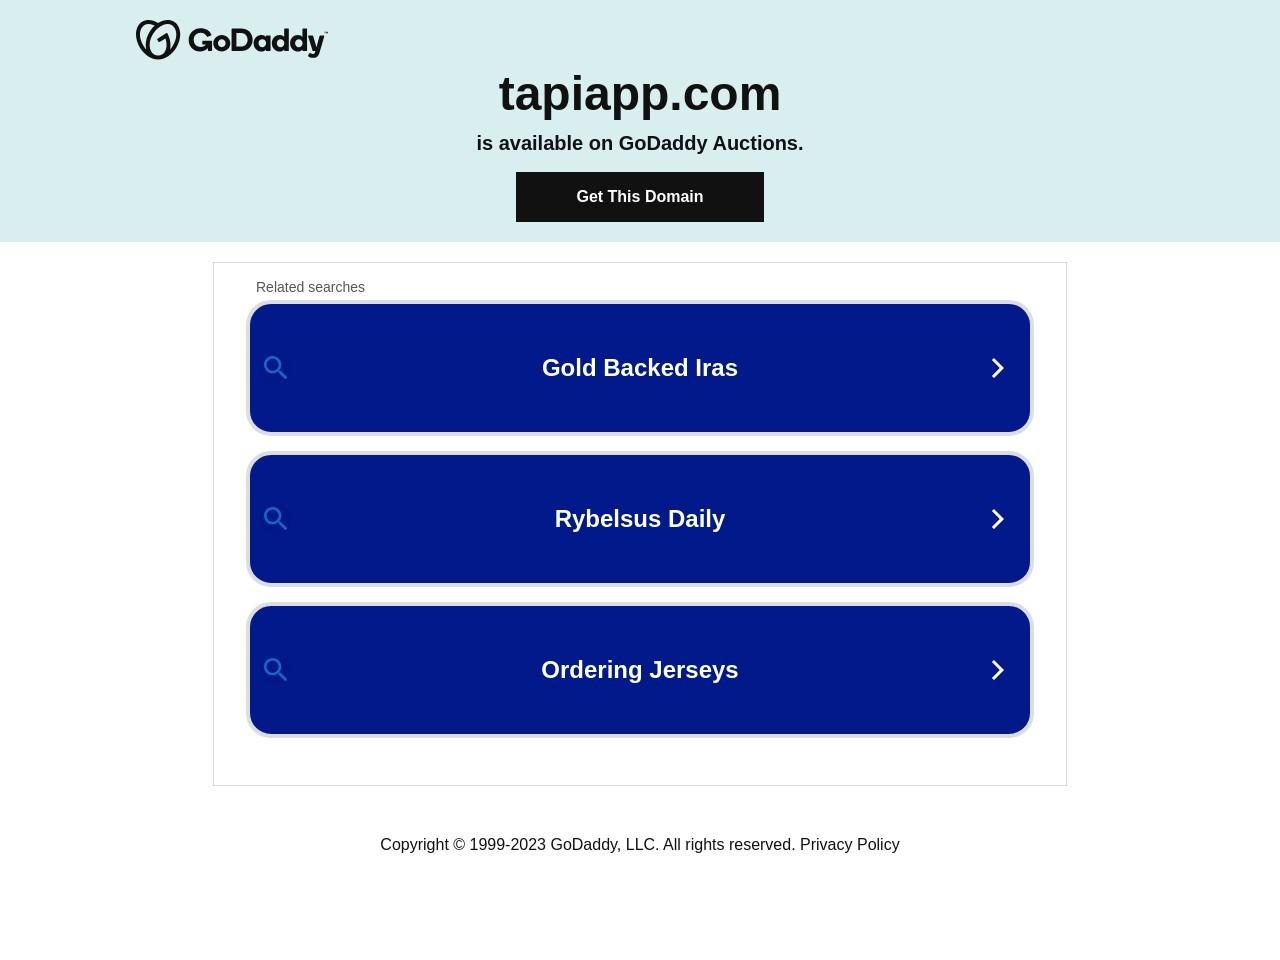 Tapiapp